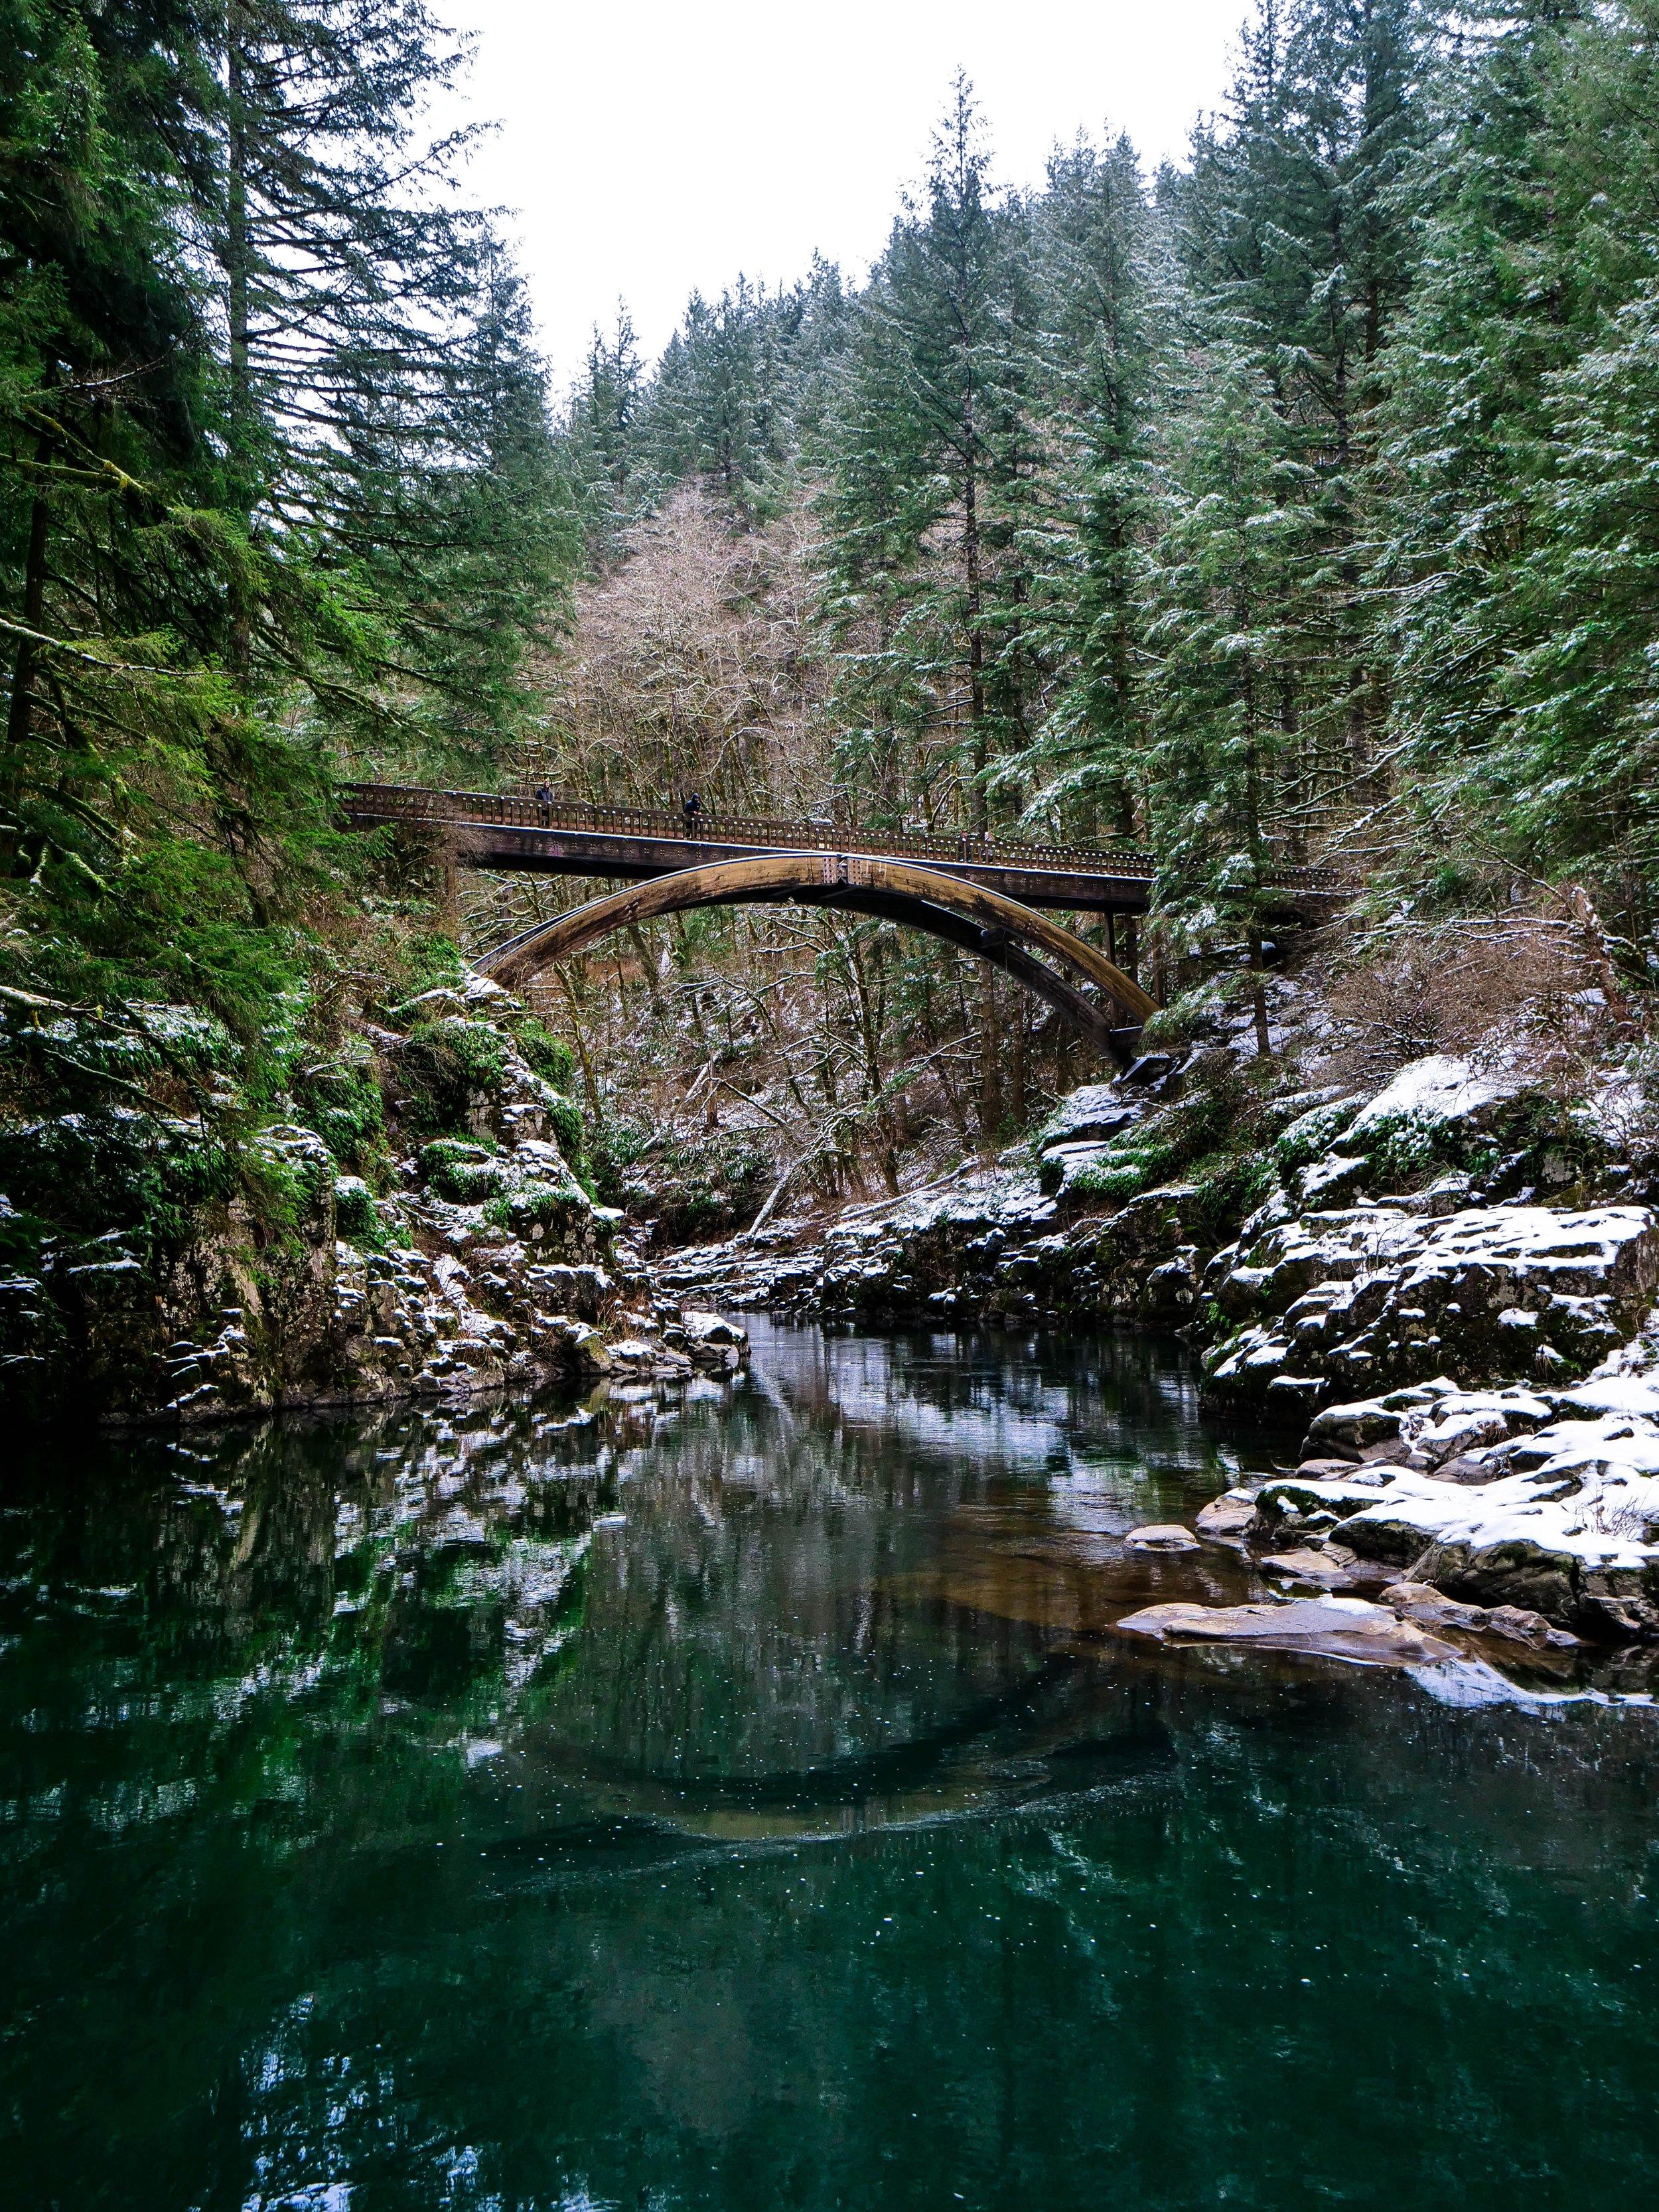 bridge-david-kovalenko-unsplash.jpg